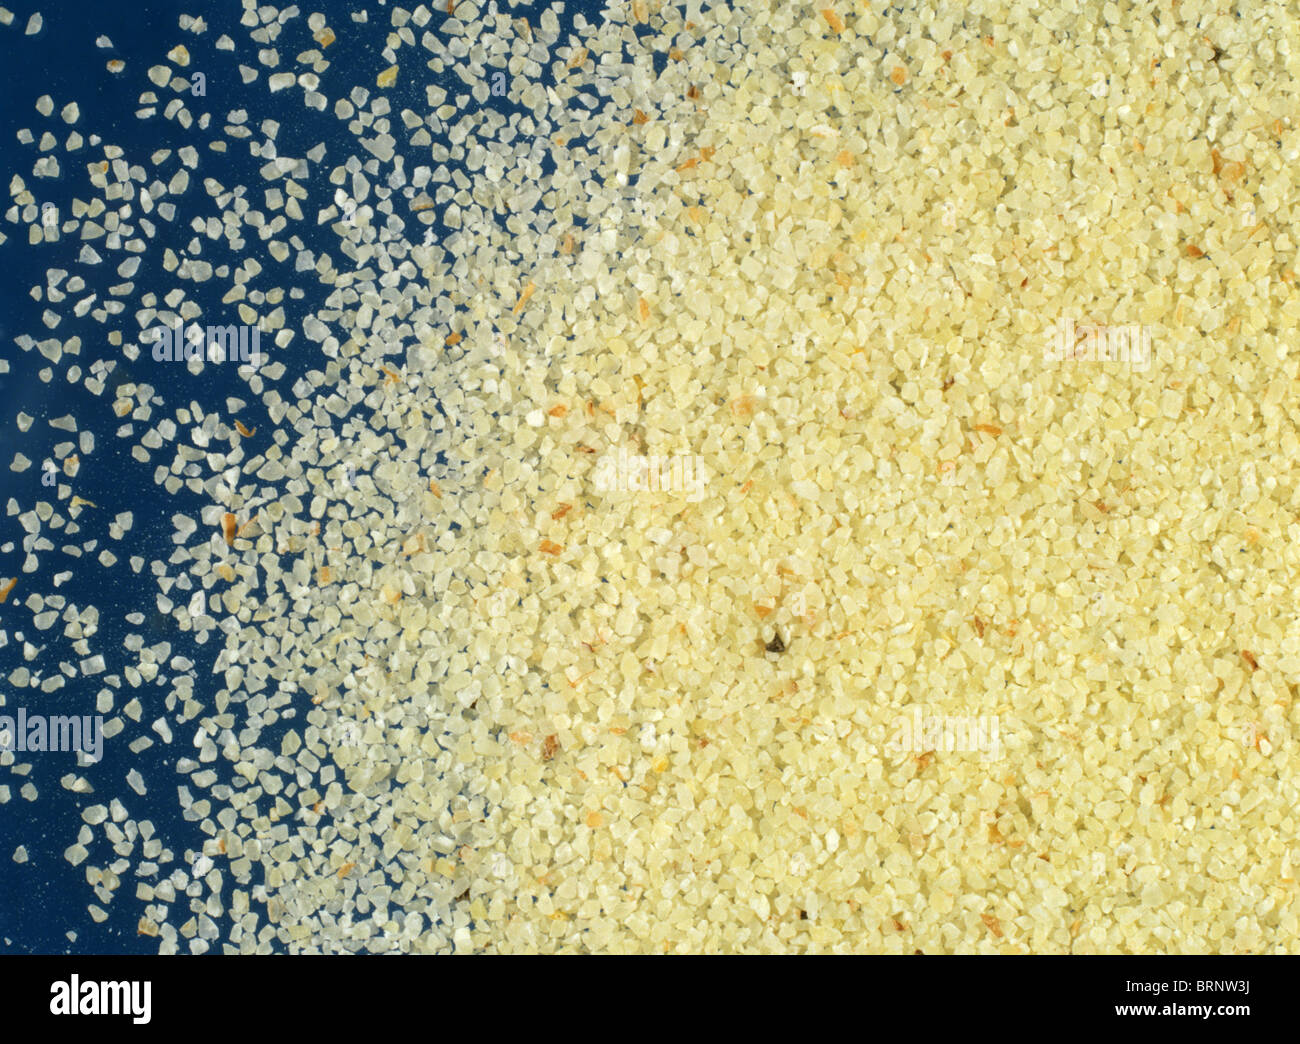 Wheat semolina (intermediate milling stage) - Stock Image